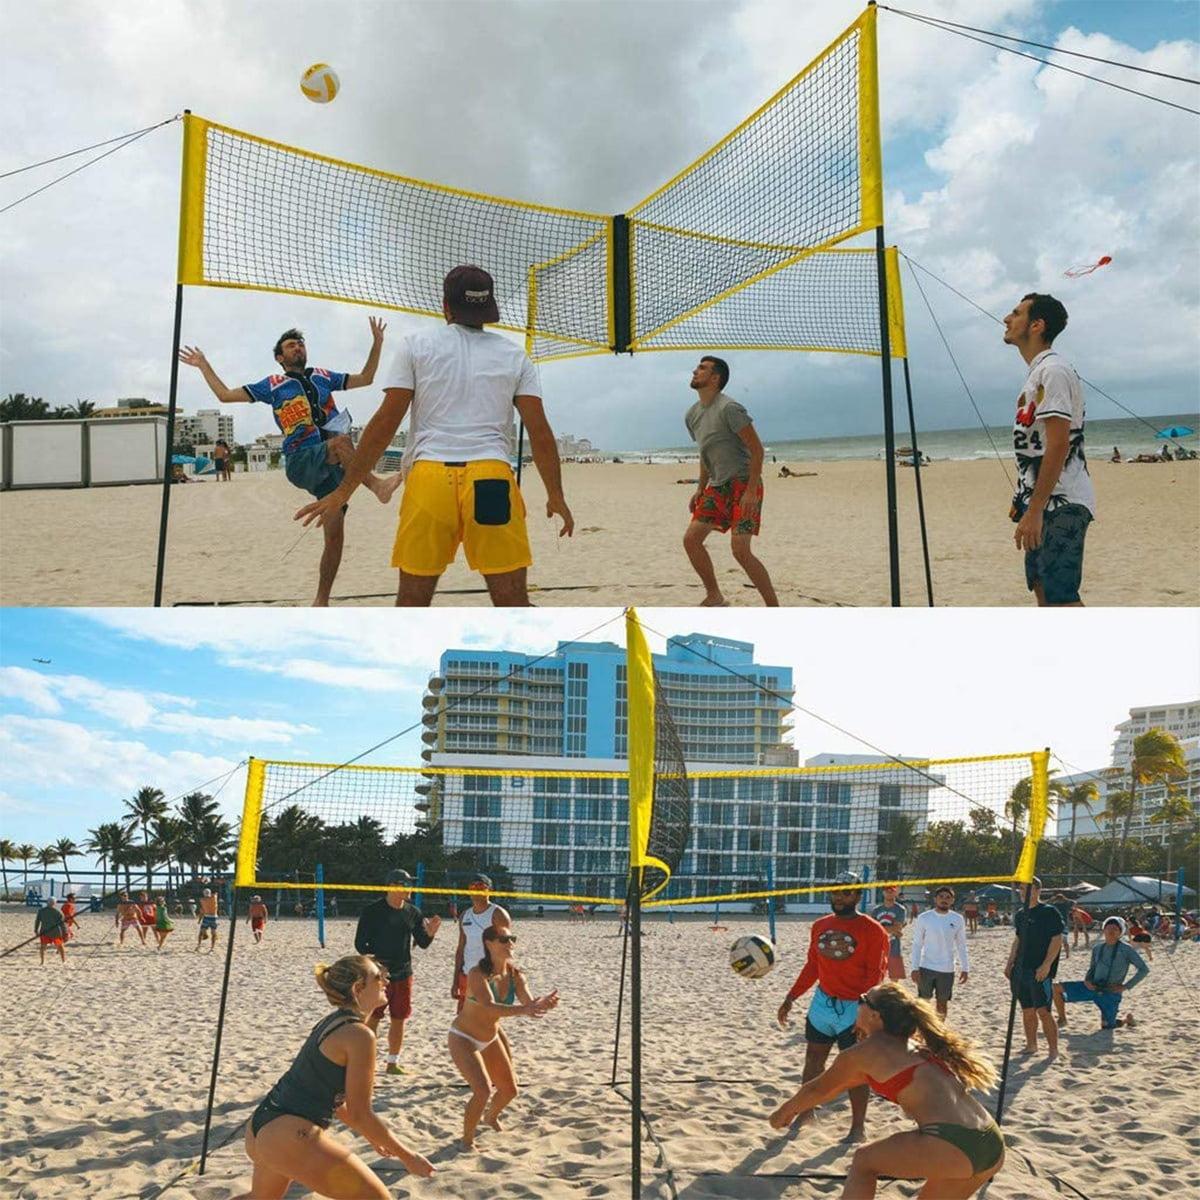 Badminton Net Portable Volleyball Net Sporting Goods Suitable For Indoor And Outdoor Walmart Canada